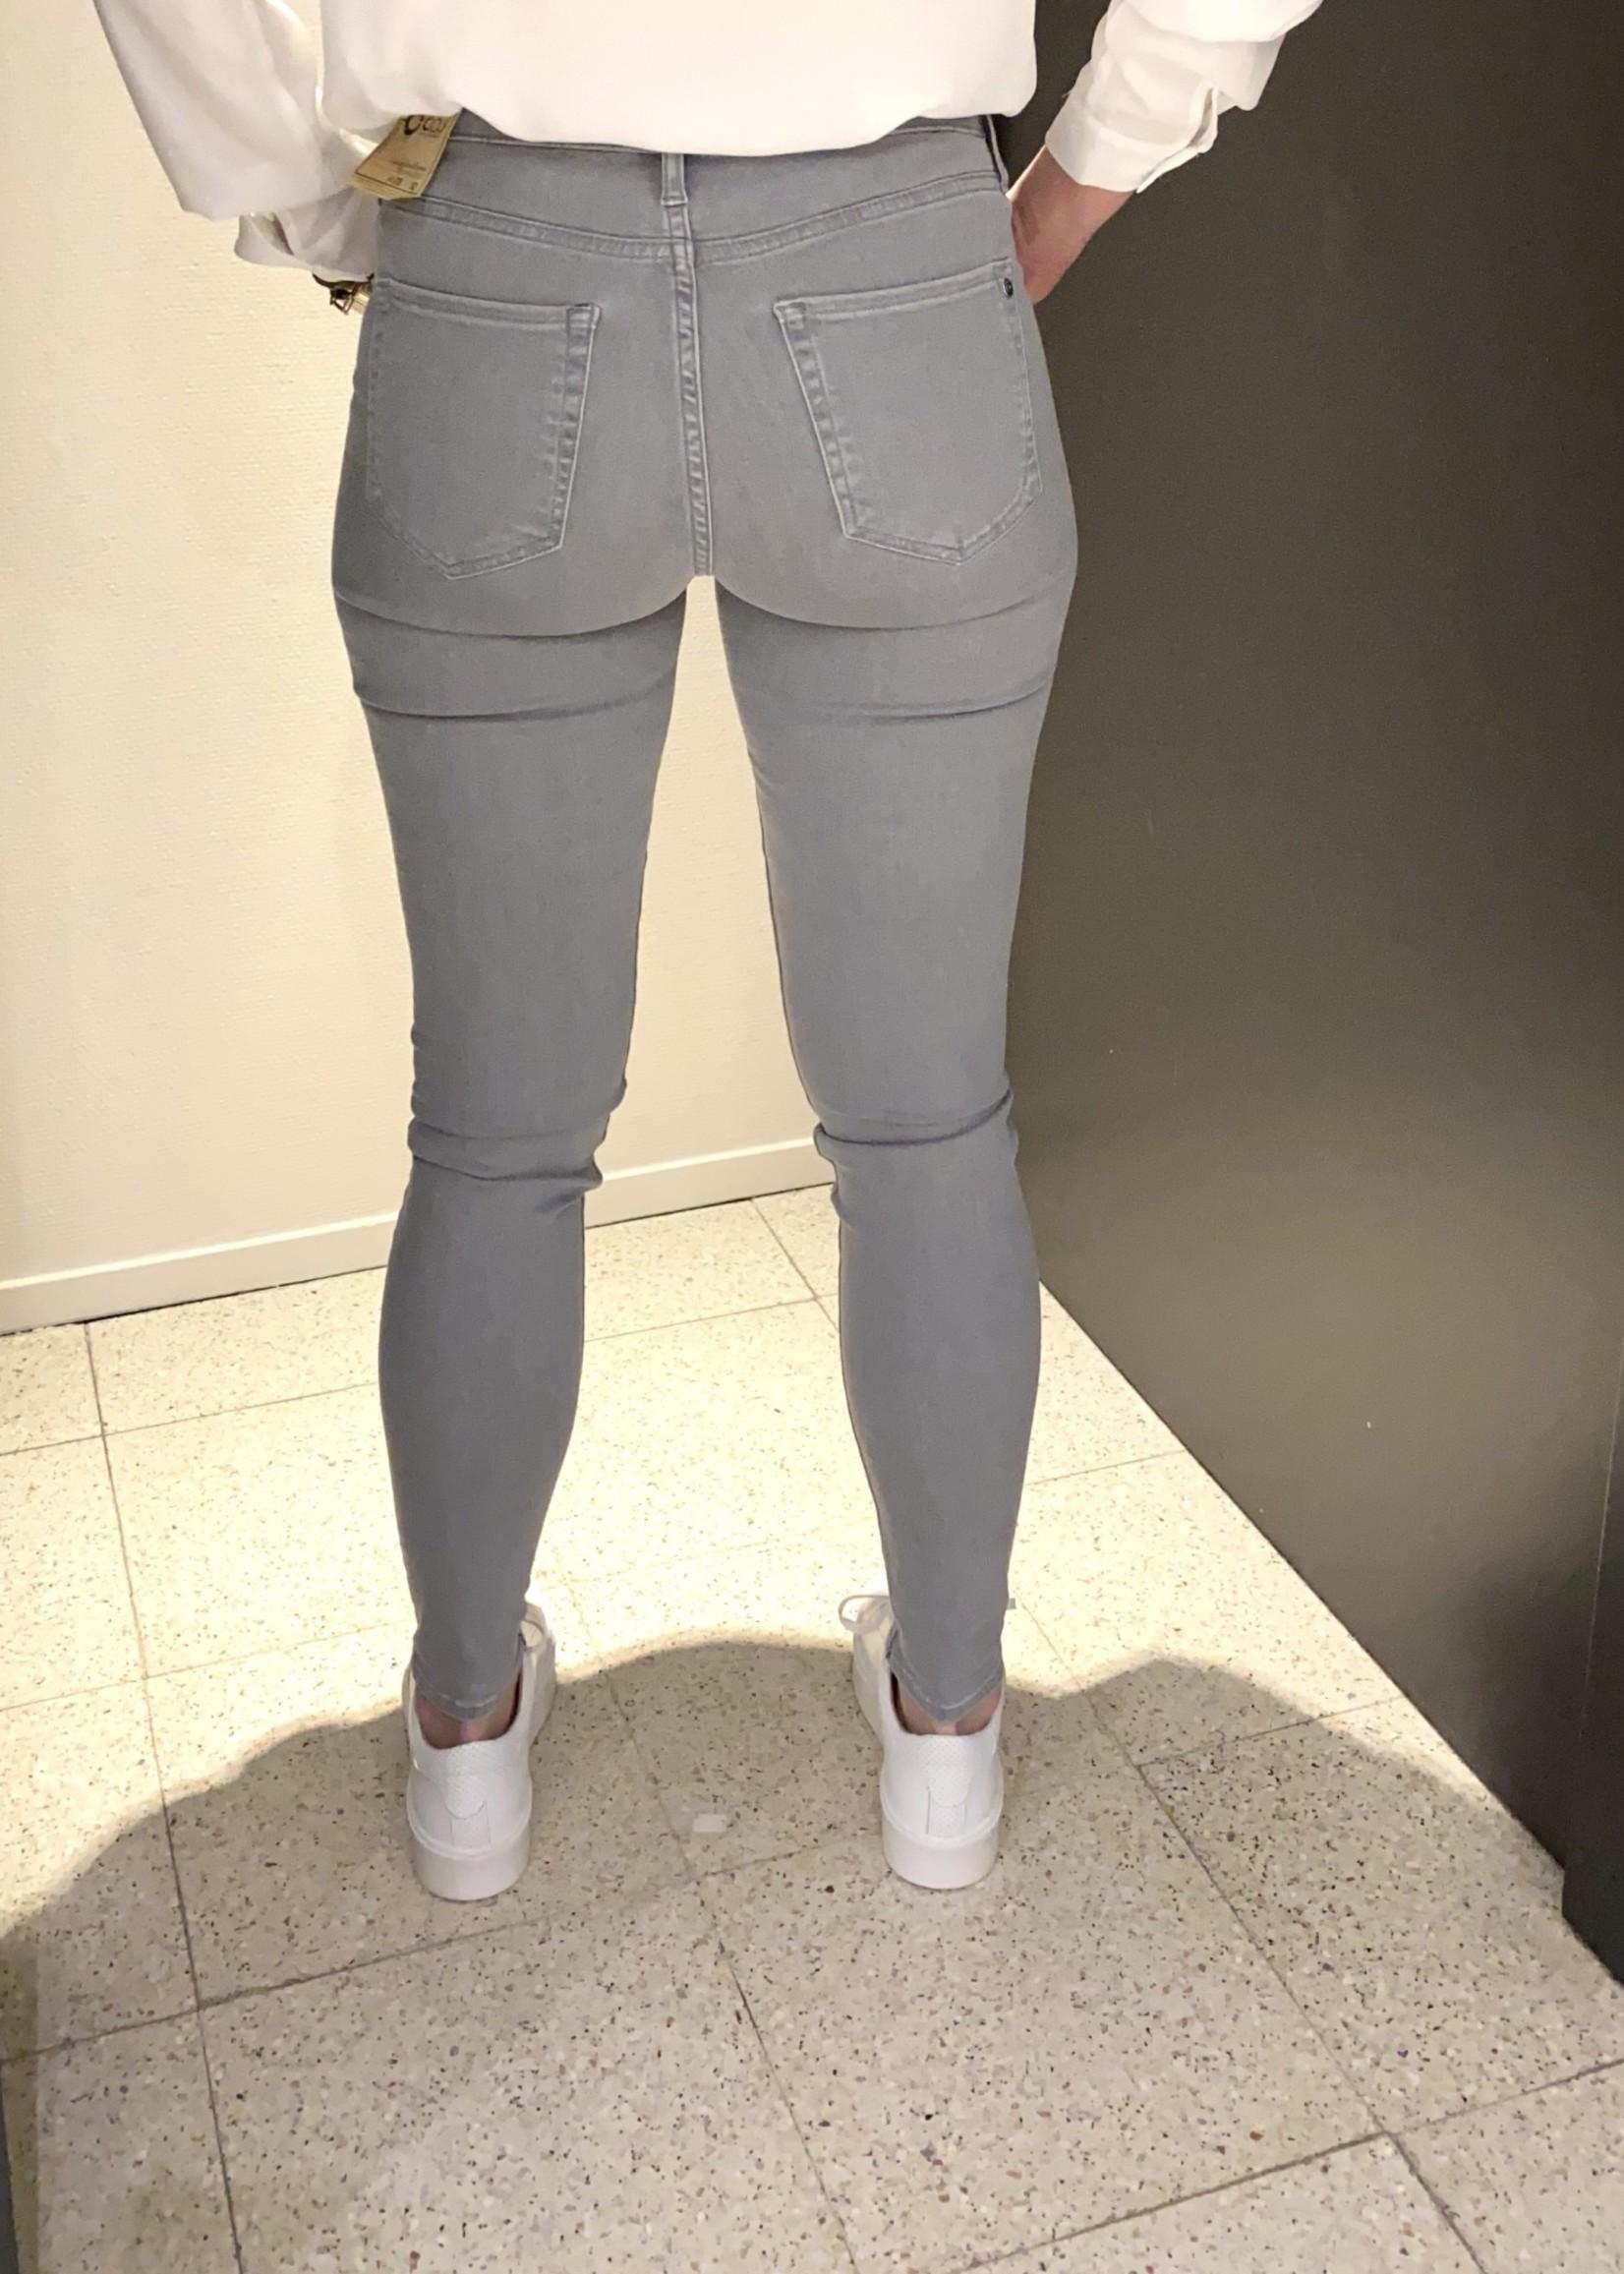 CUP OF JOE JEANS Sophia skinny jeans smoke grey L30